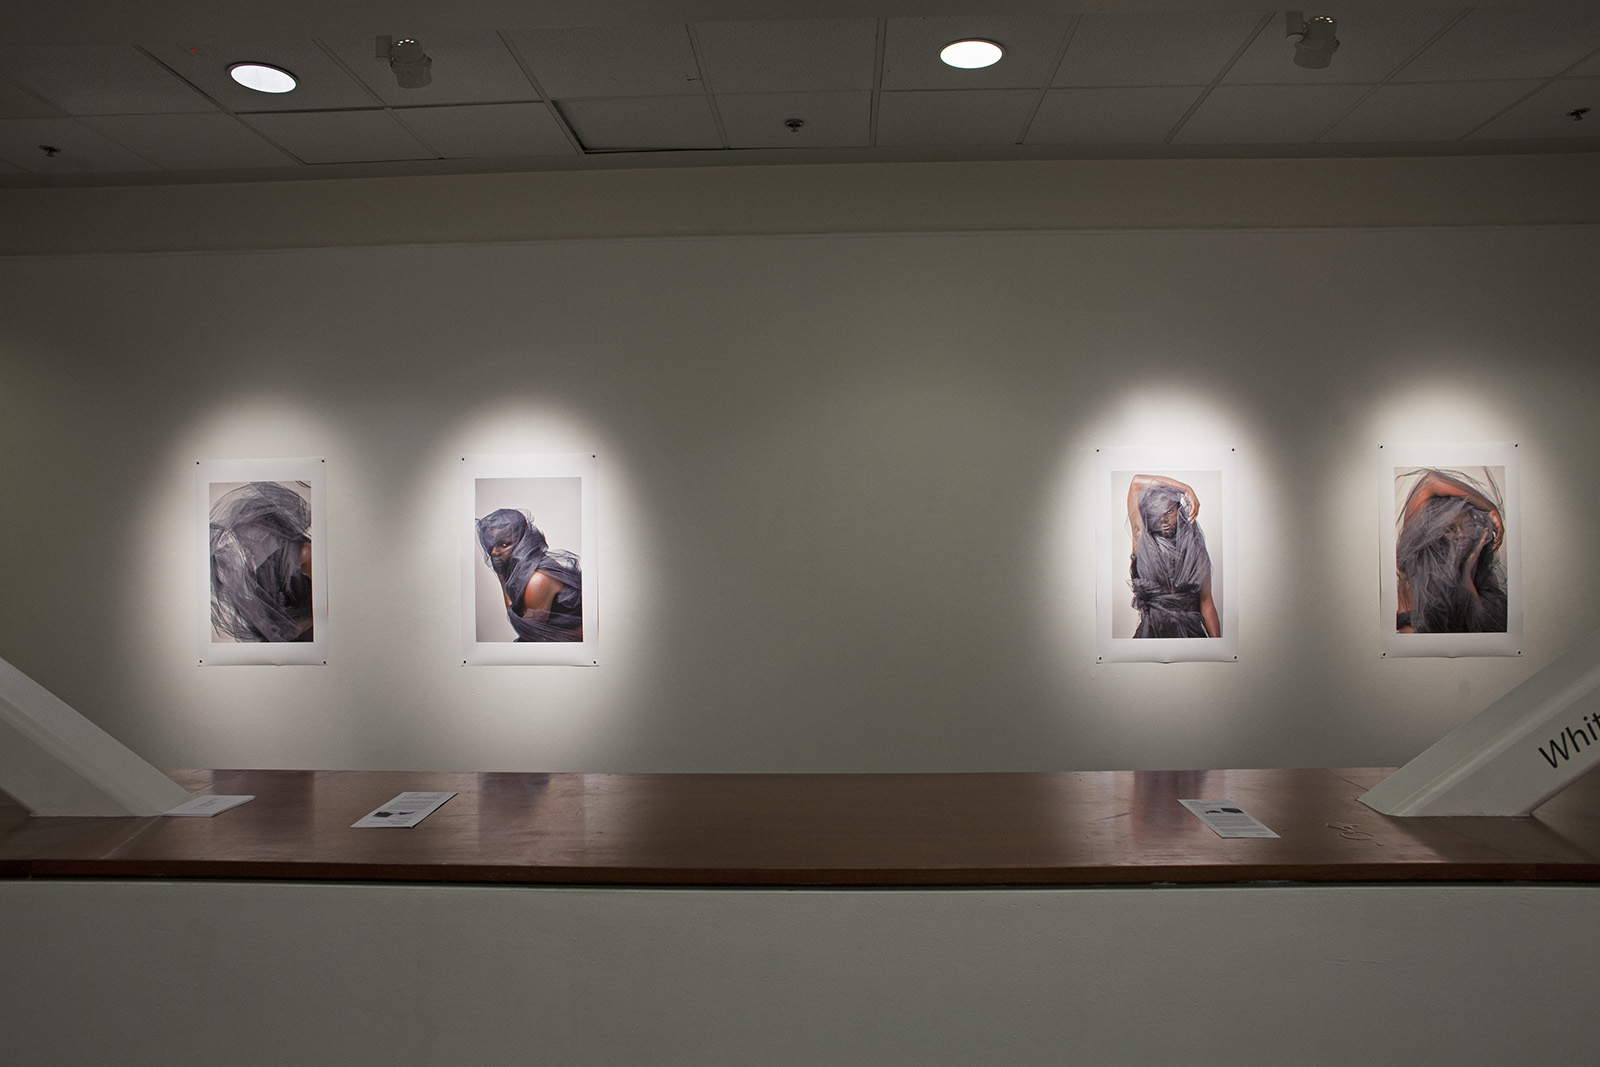 Littman & White Gallery (2017)